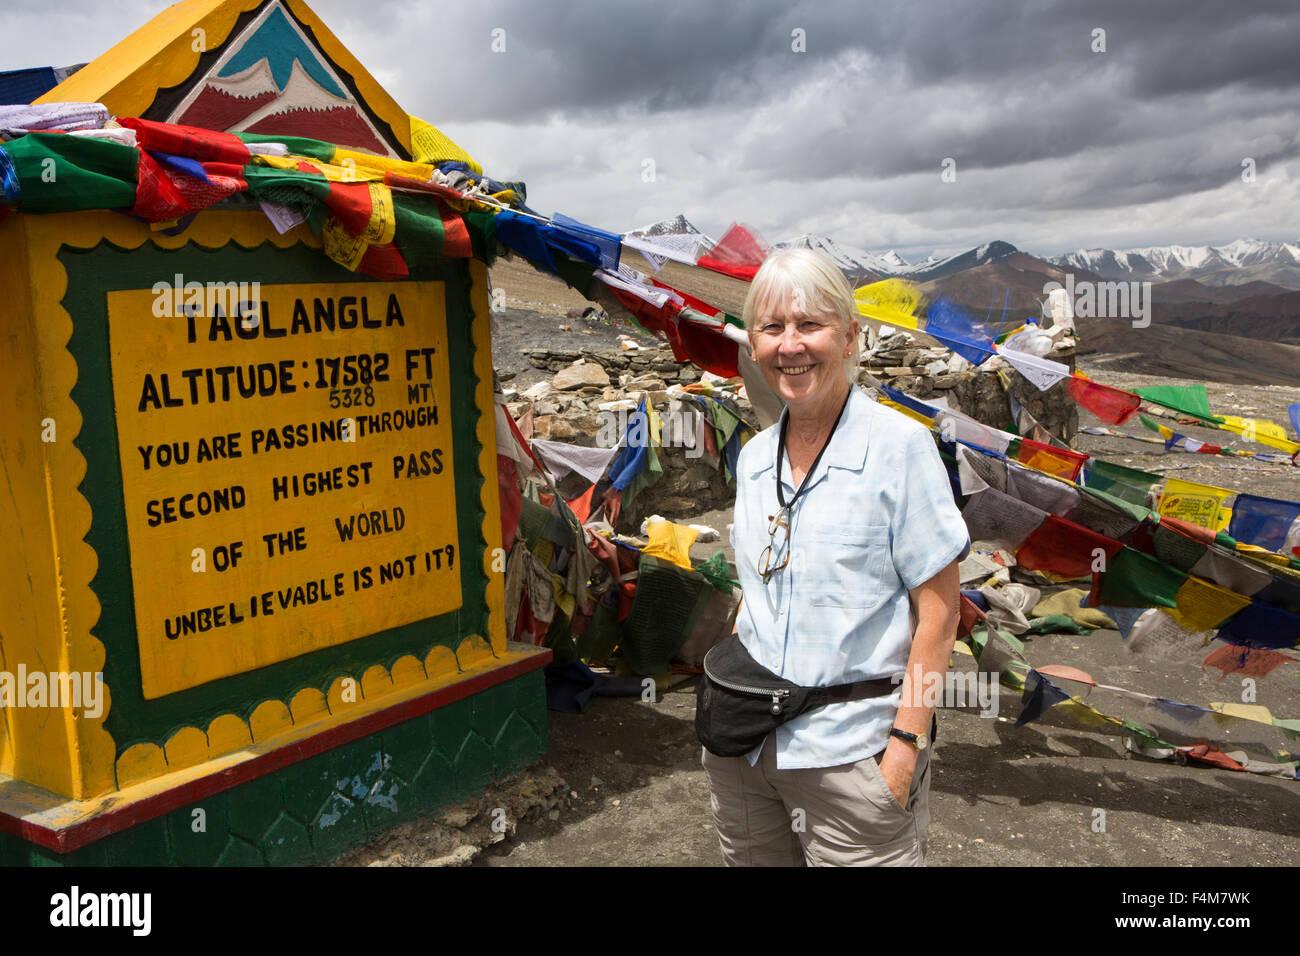 India, Jammu & Kashmir, Ladakh, Taglang La pass top, female tourist at summit sign - Stock Image